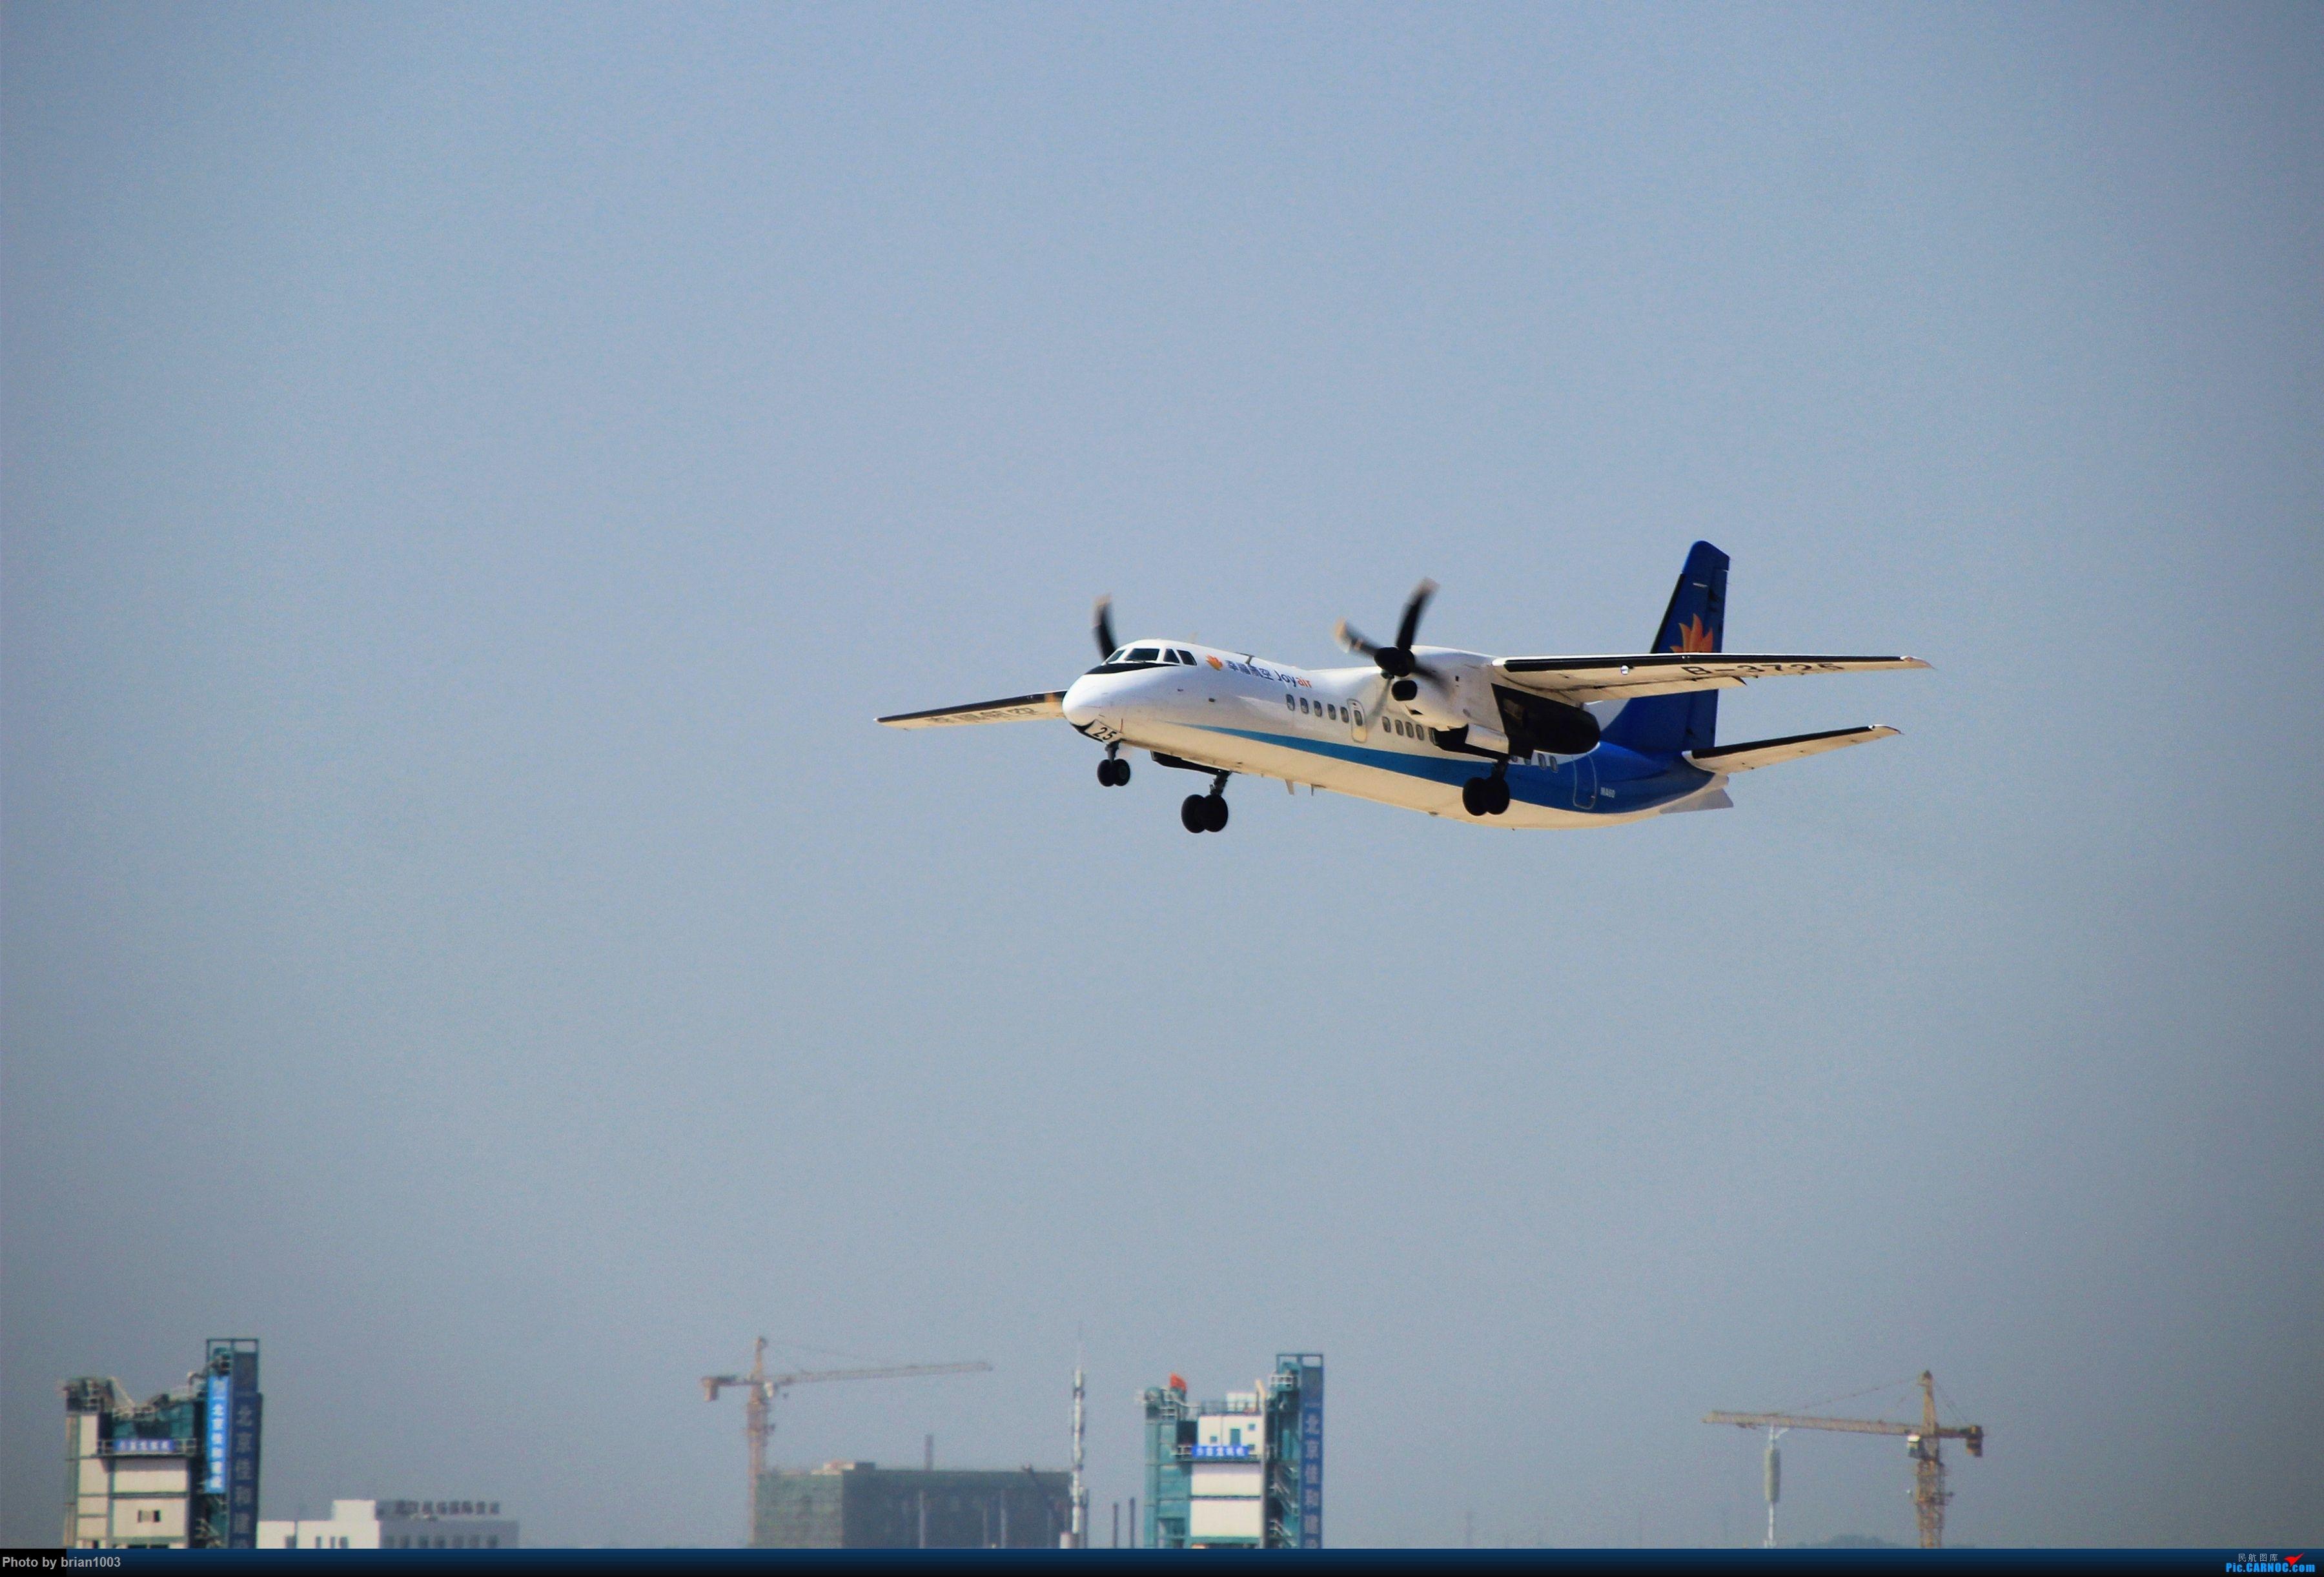 Re:[原创]WUH武汉天河机场拍机之喜迎酷航788和偶遇某其他飞机 XIAN AIRCRAFT MA 60 B-3725